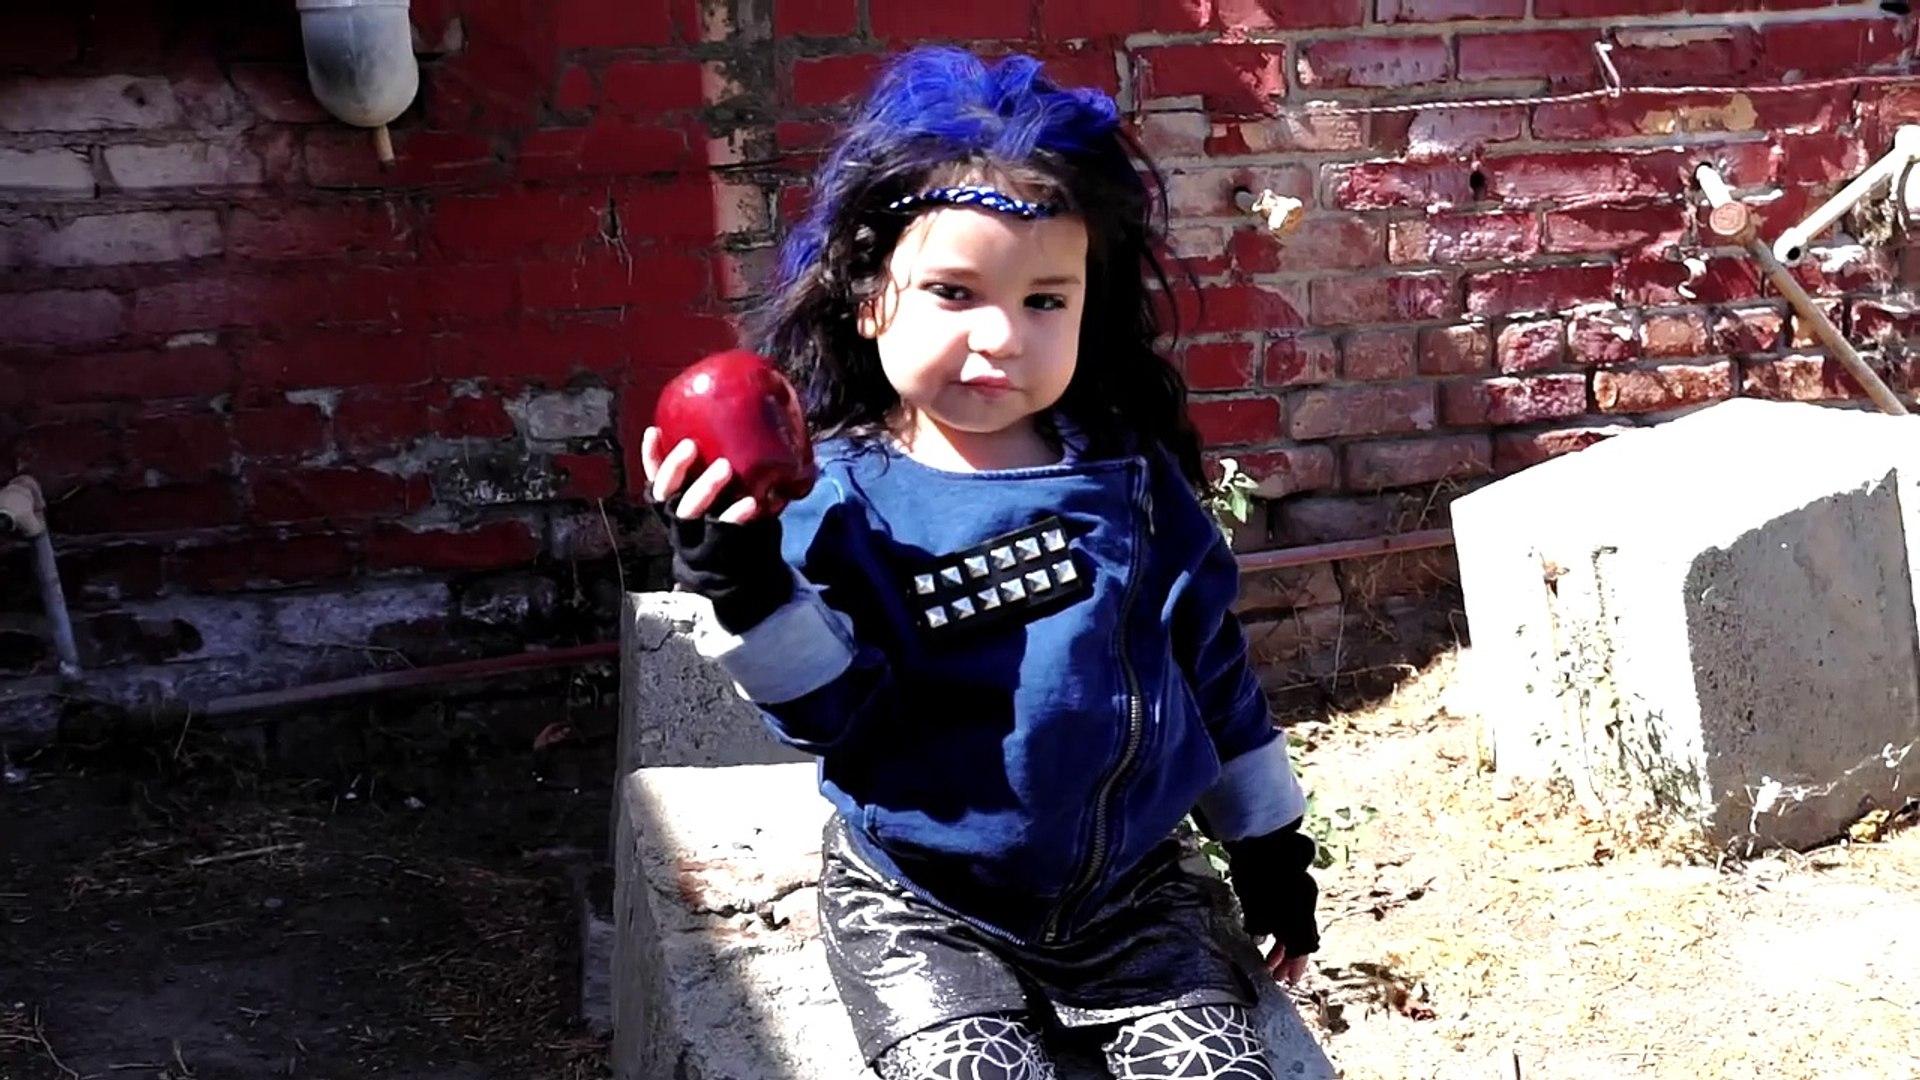 Evie Disney Descendants Inspired Make Up and Costume tutorial DIY Halloween